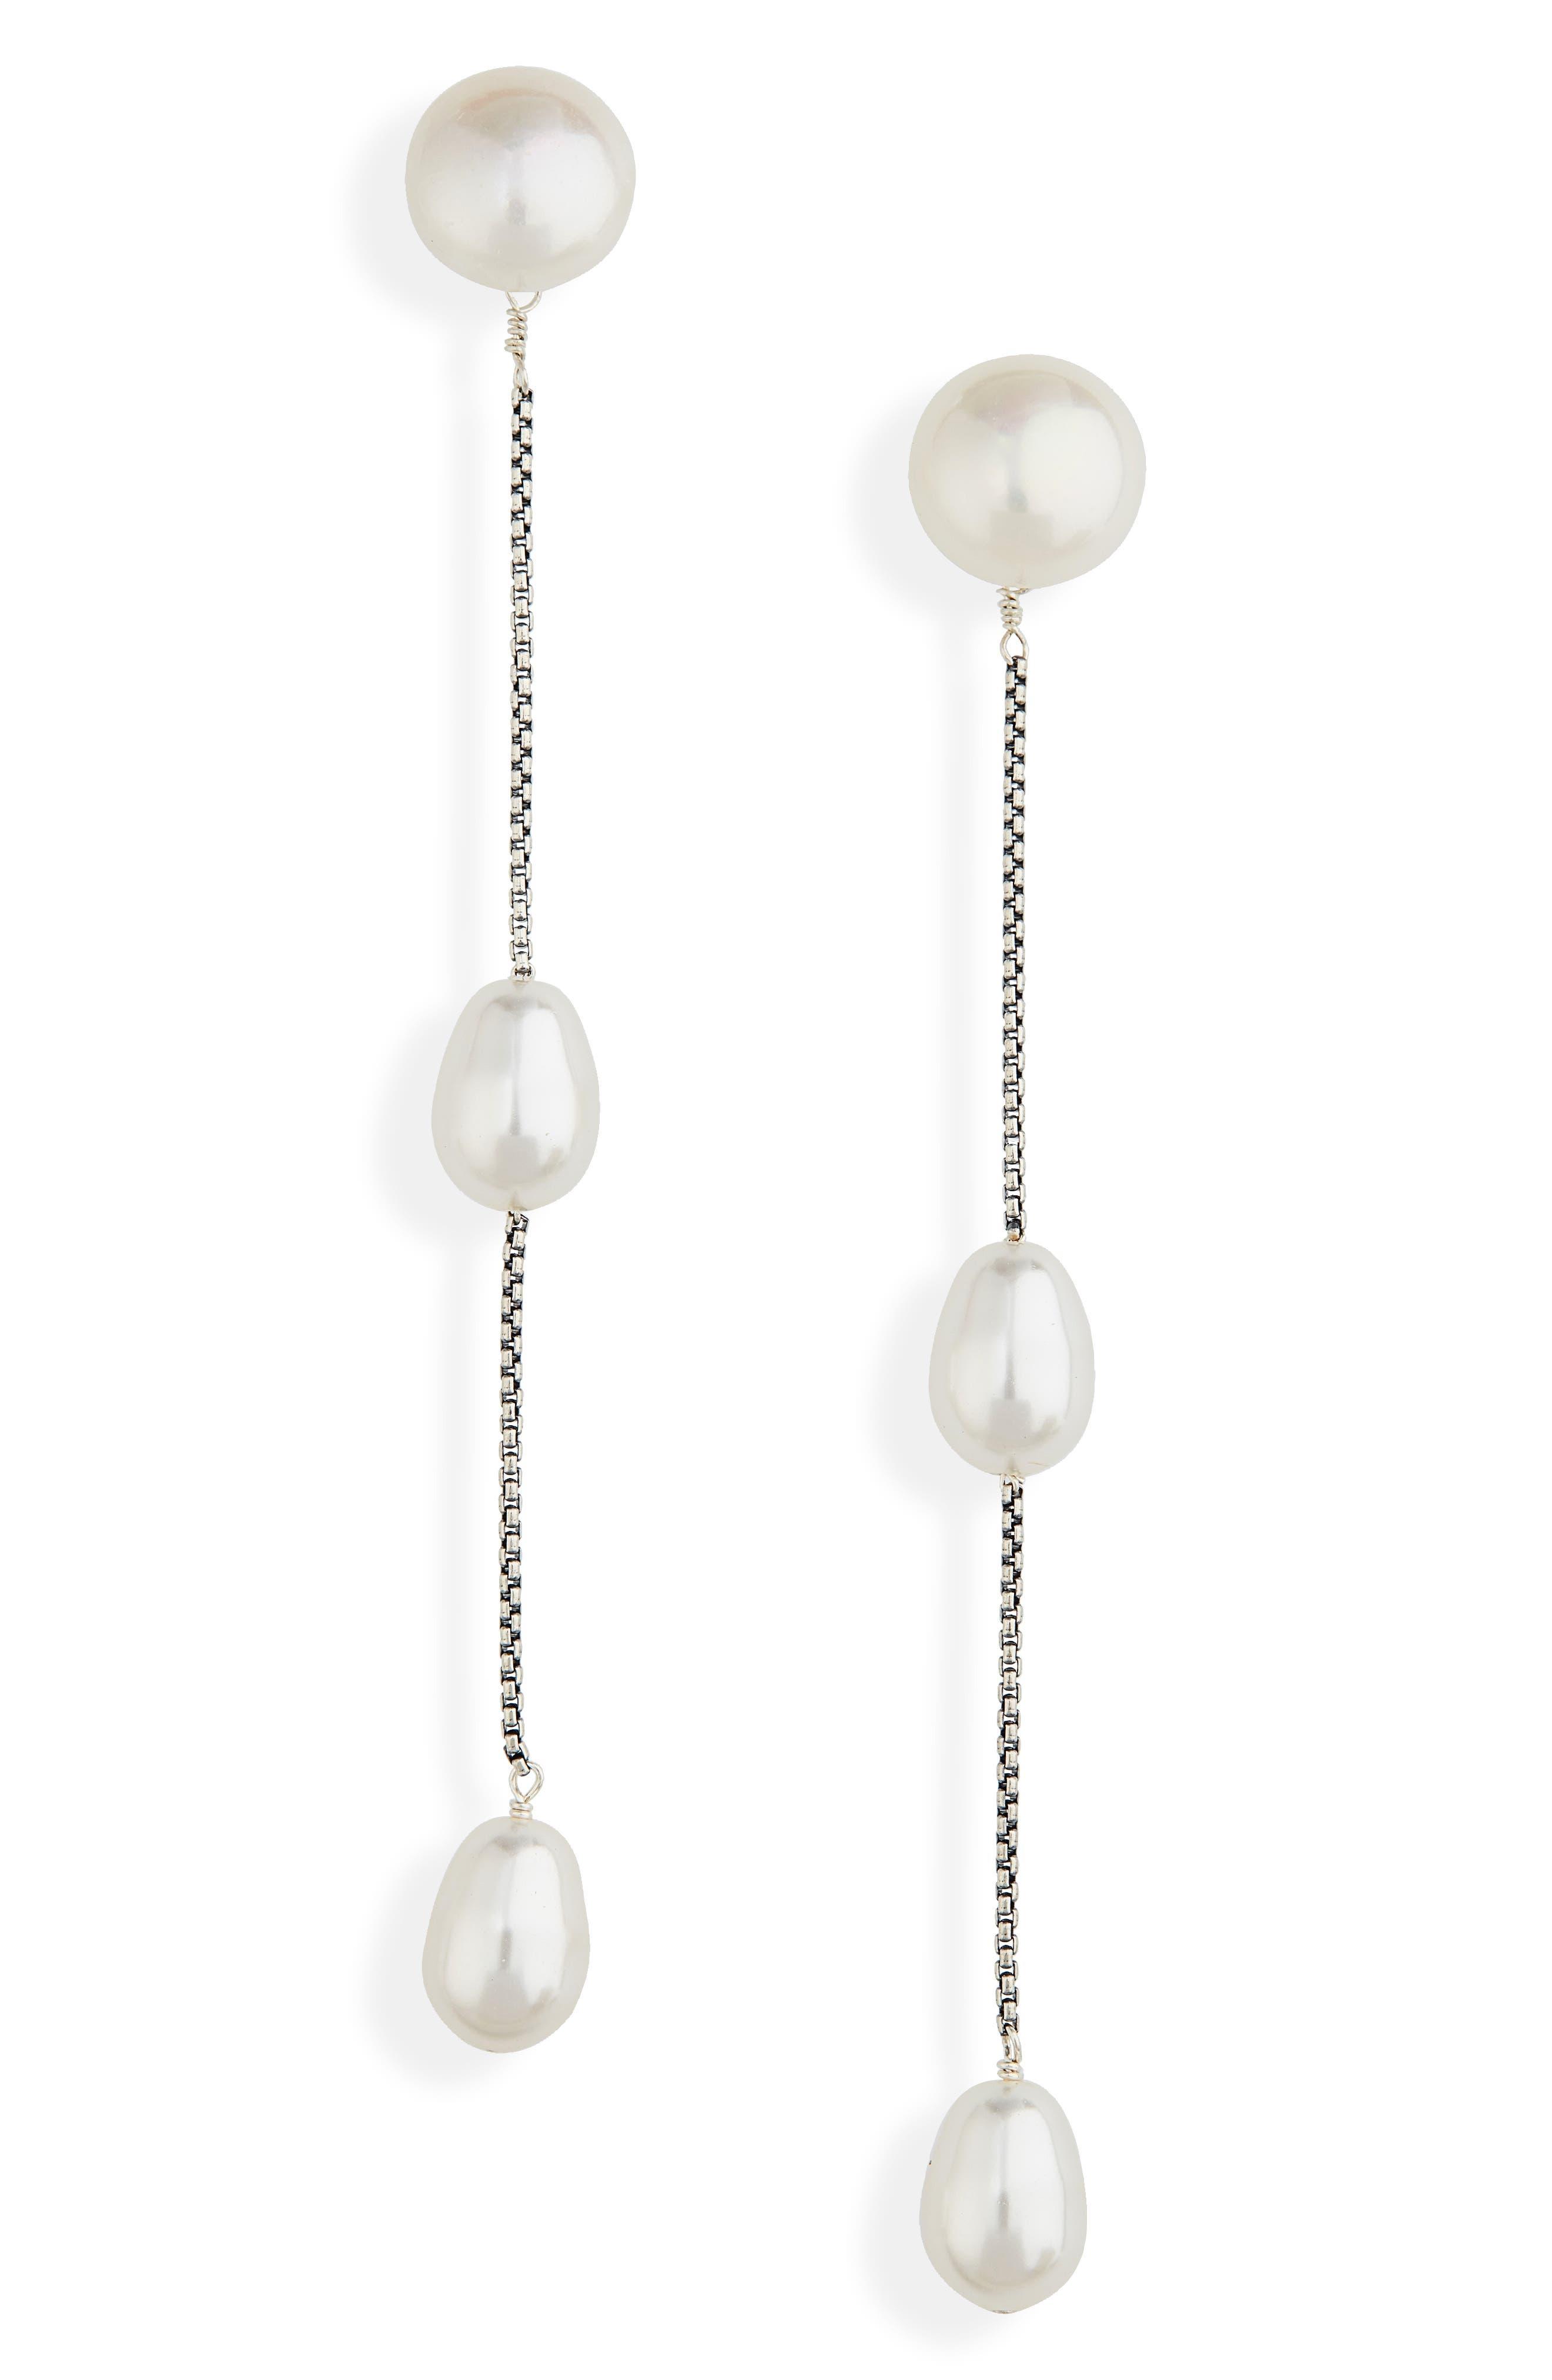 Imitation Pearl Linear Drop Earrings,                         Main,                         color, STERLING SILVER/ FAUX PEARL